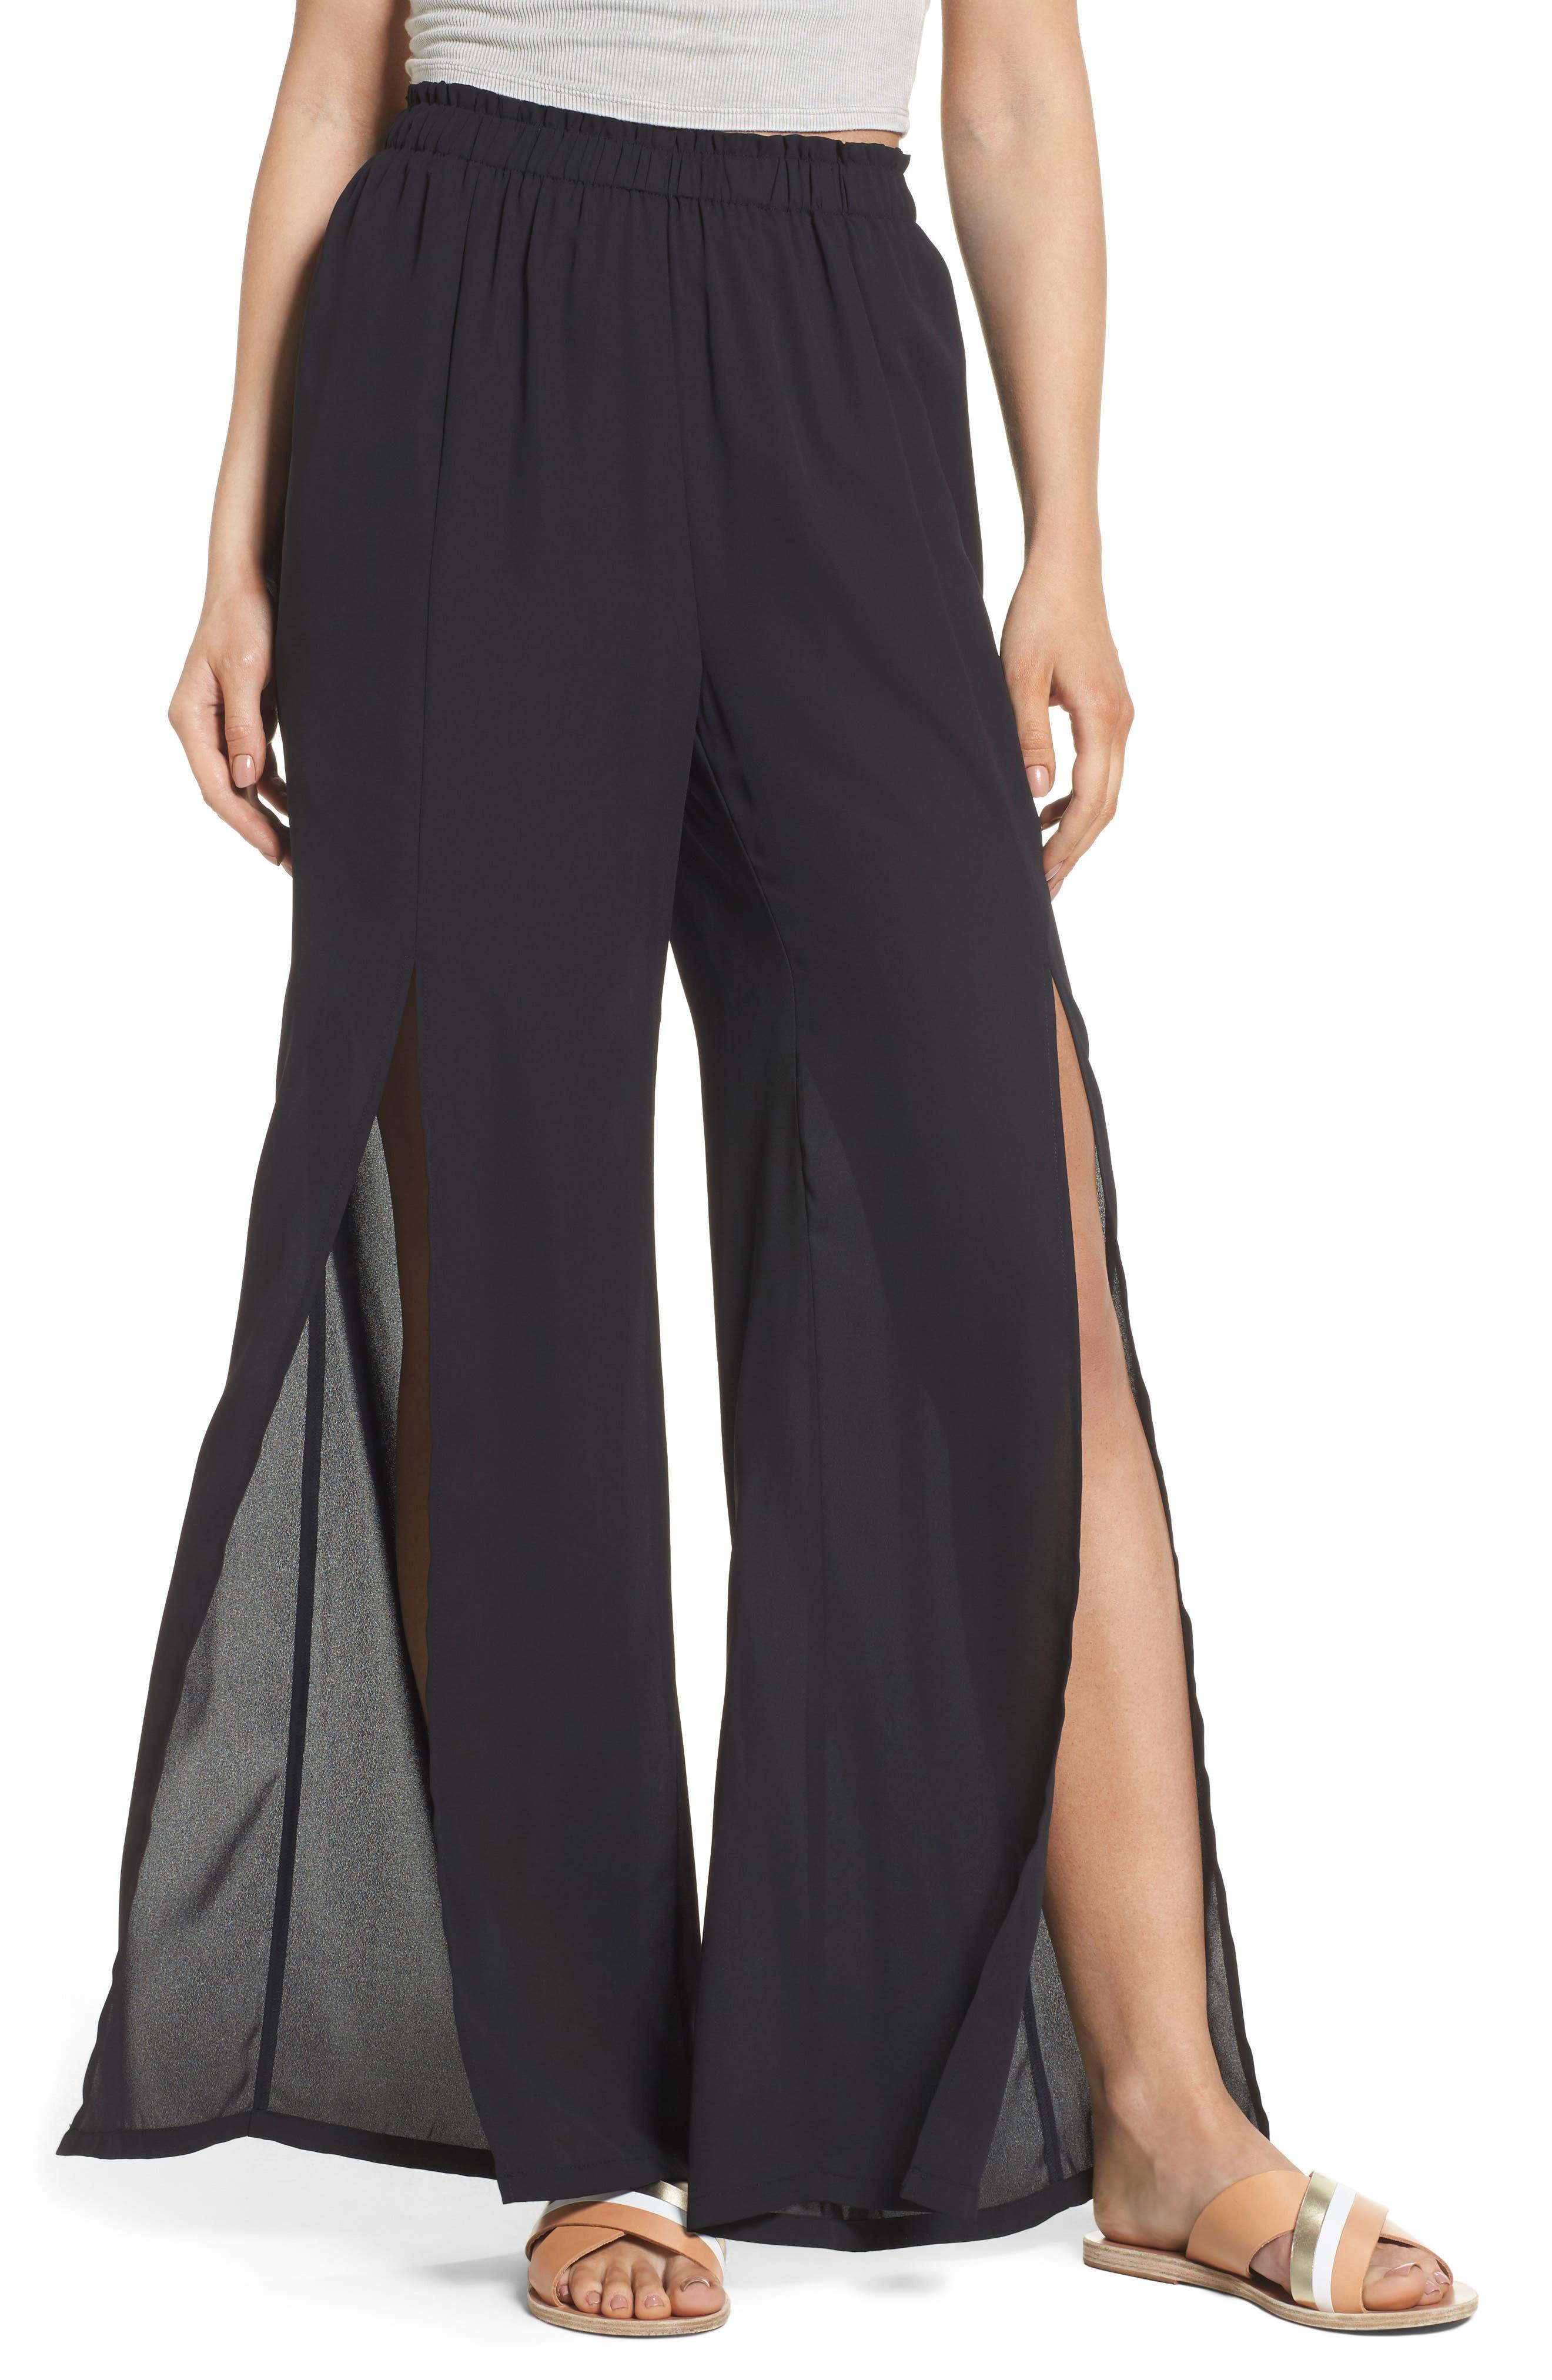 Mimi Chica Slit Detail Pants